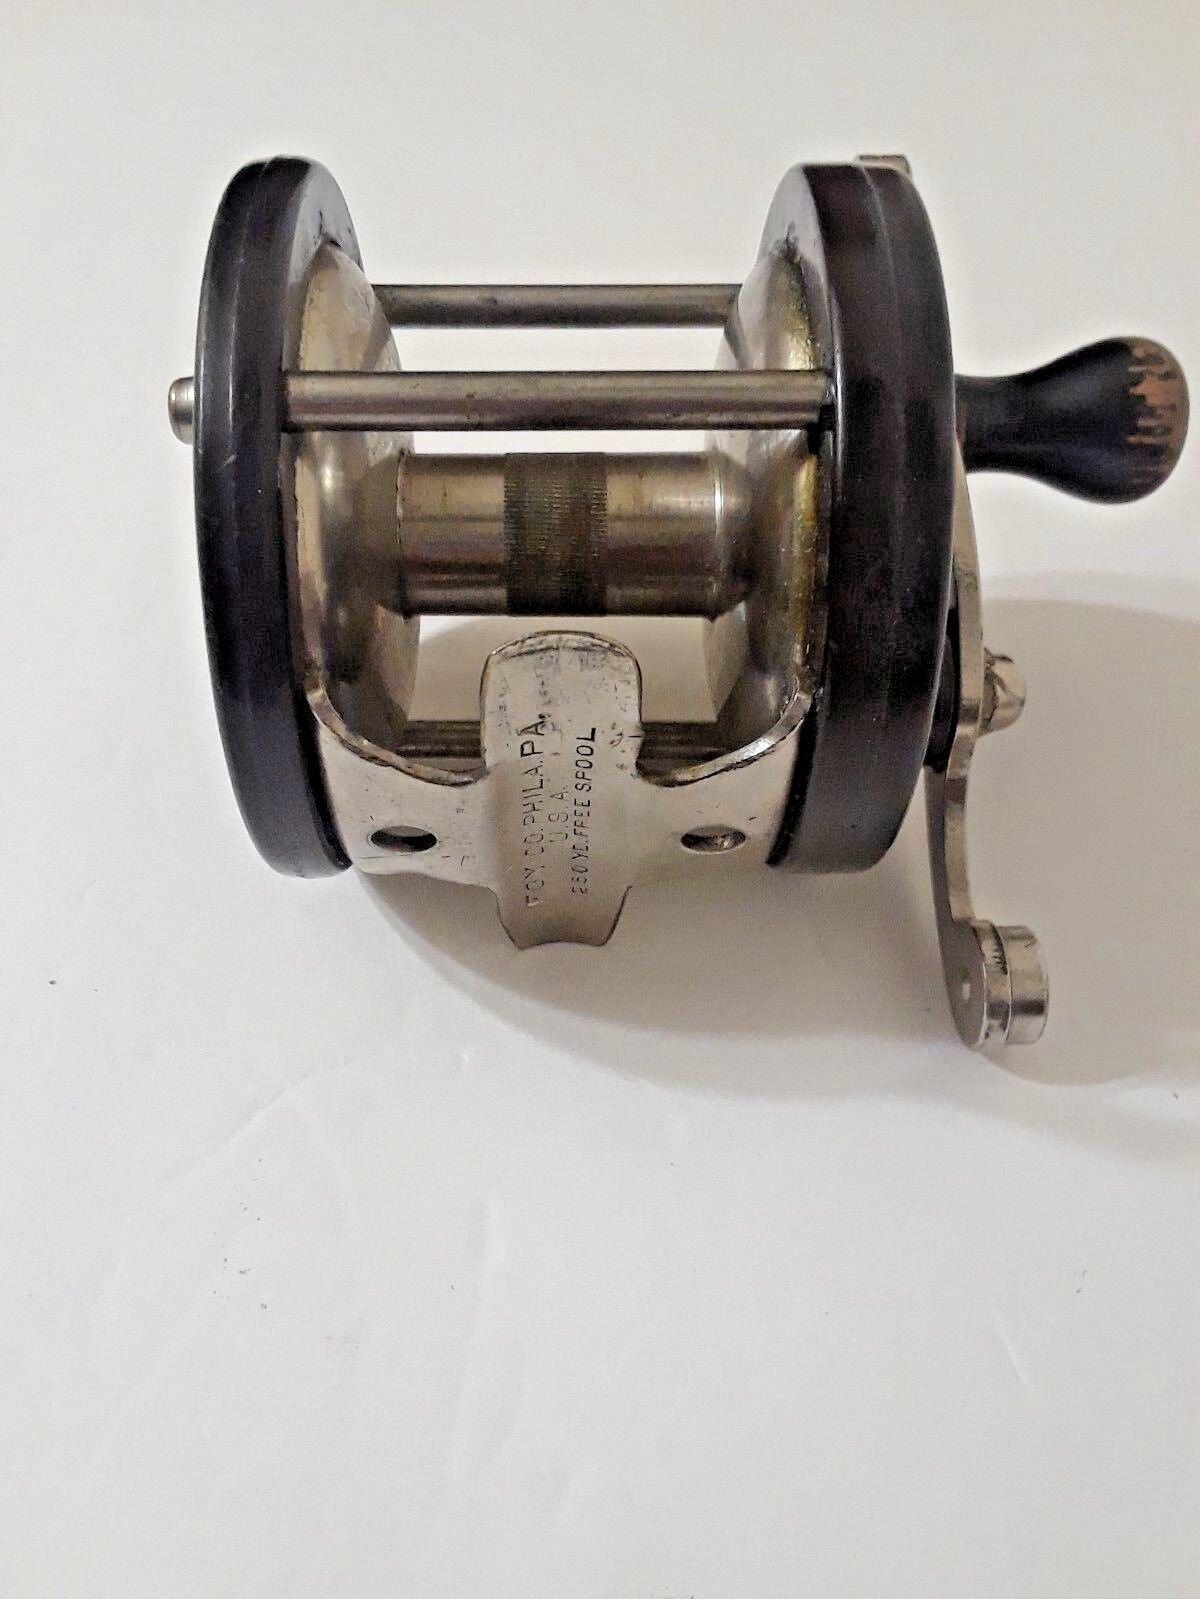 Vintage A H Fox  Co Phila. PA 1930s Fishing Casting Reel 250 Yard Spool  creative products